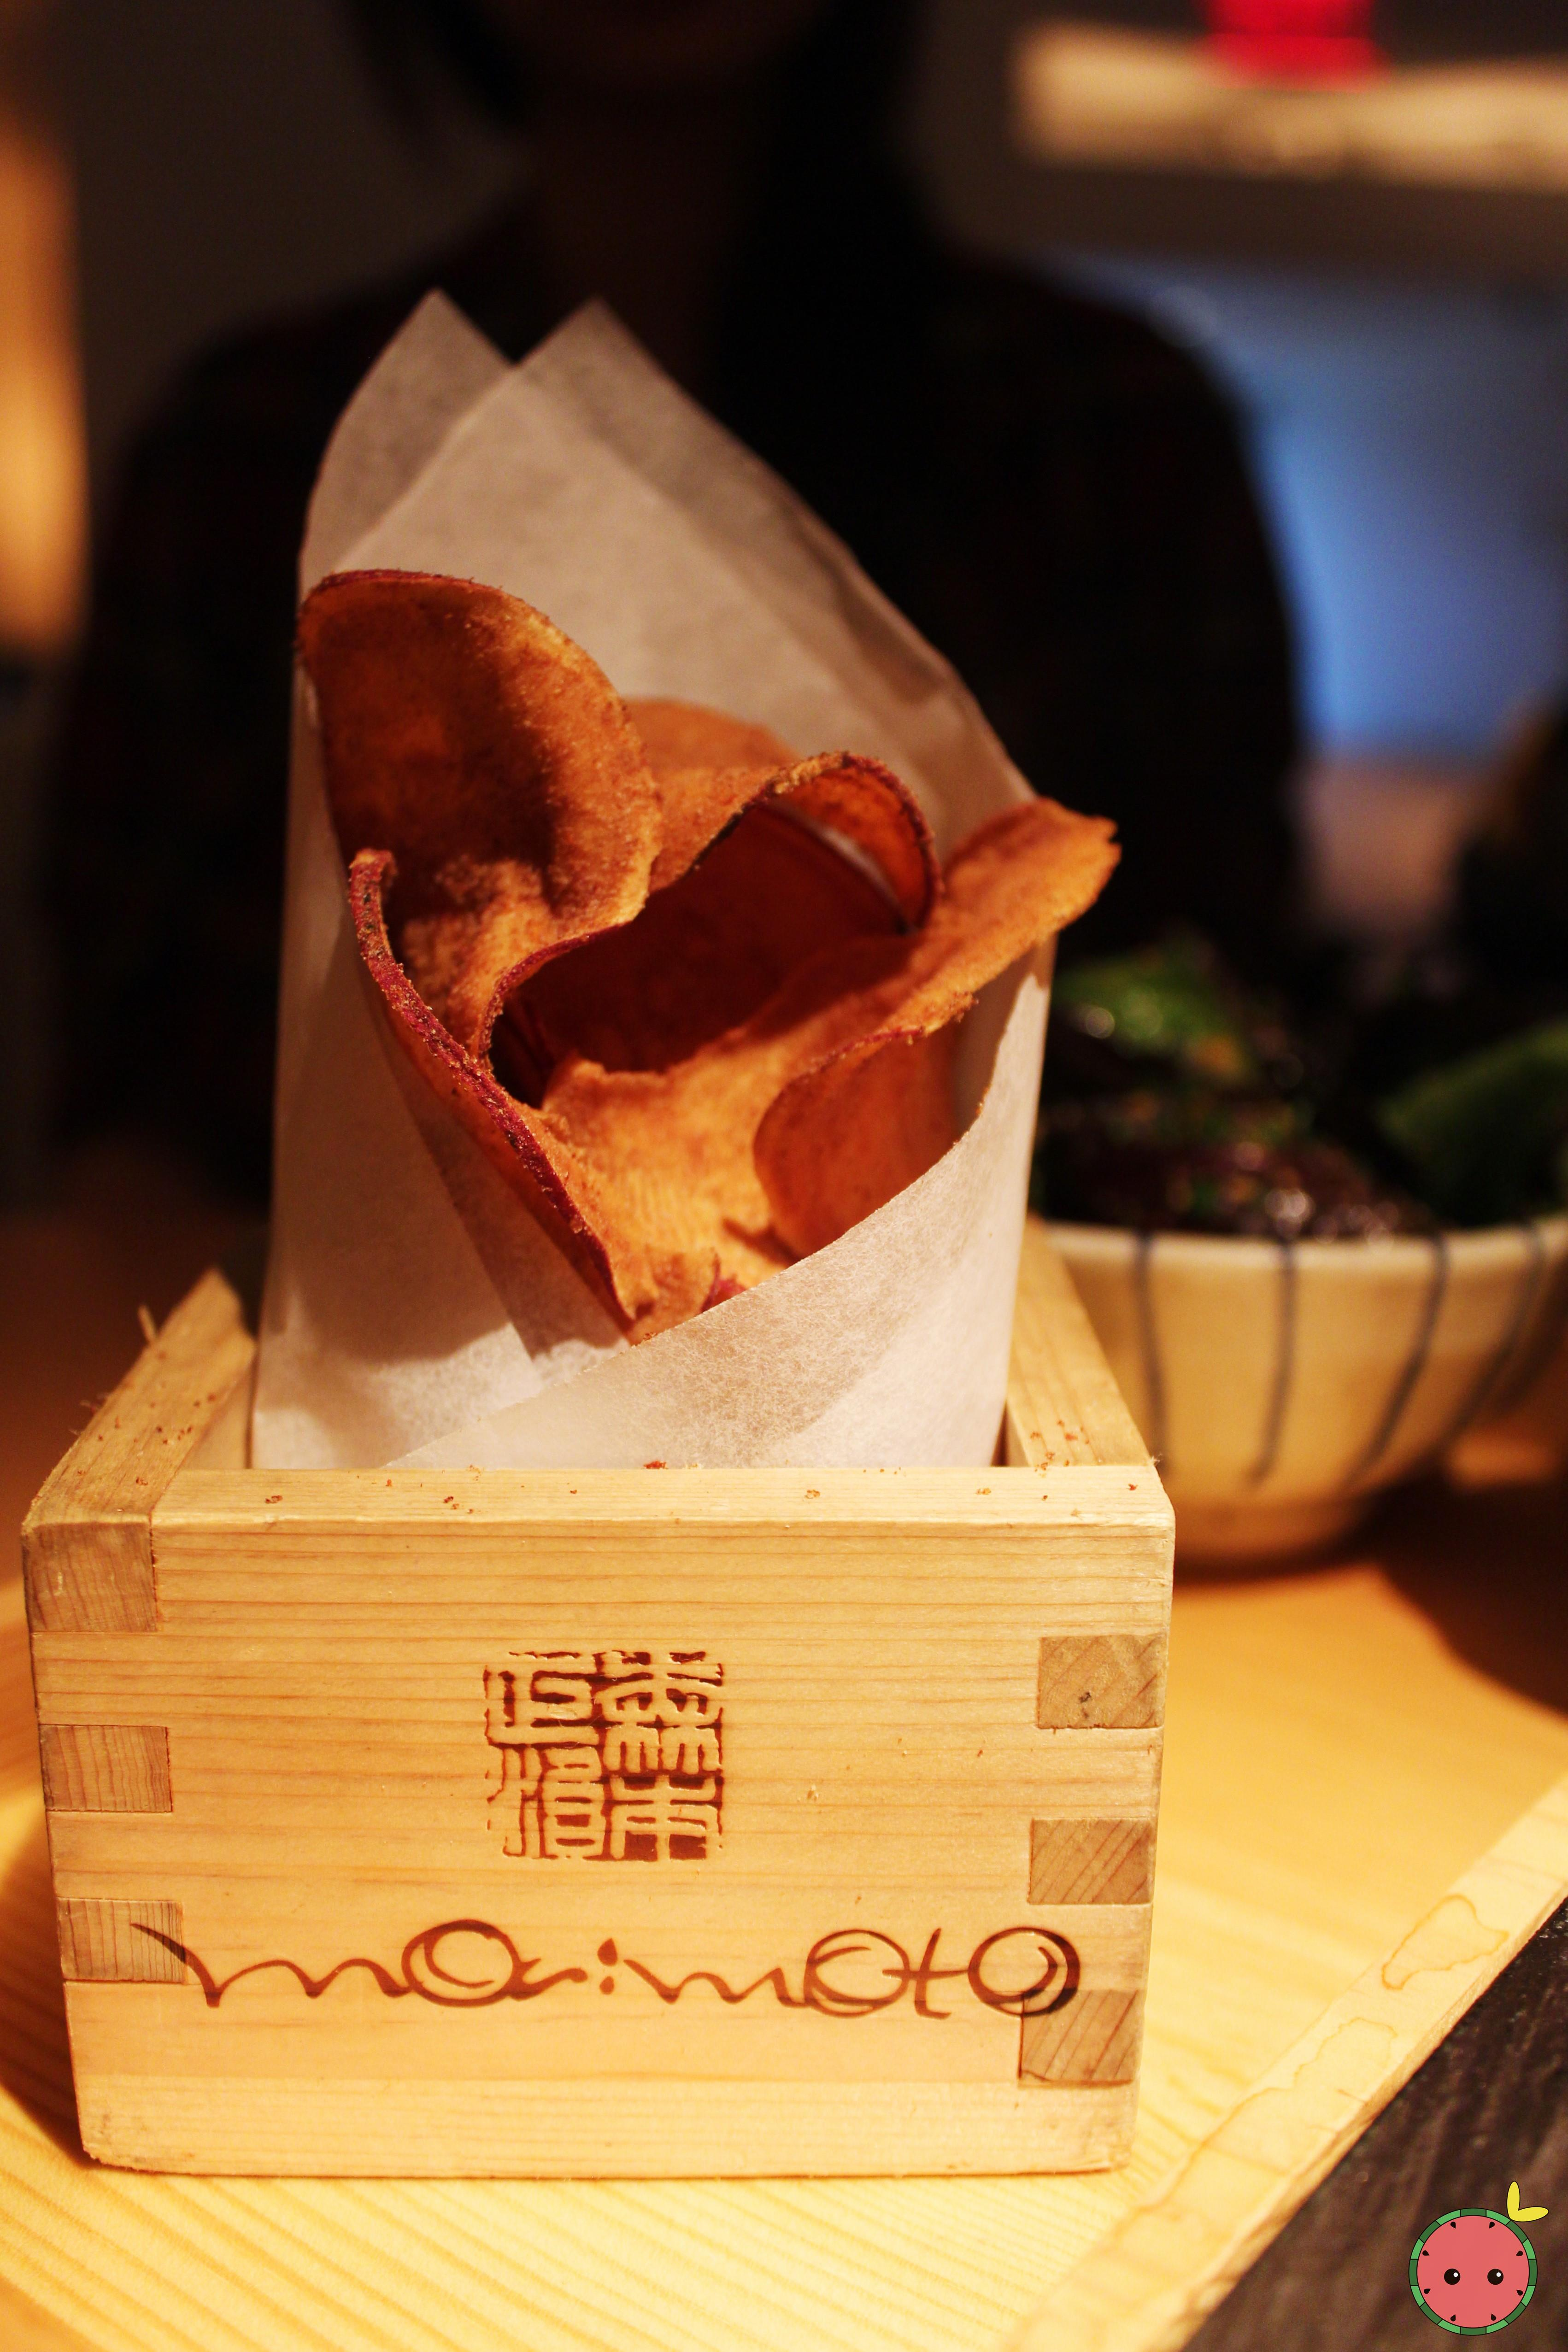 Soy sat and vinegar Japanese sweet potato chips